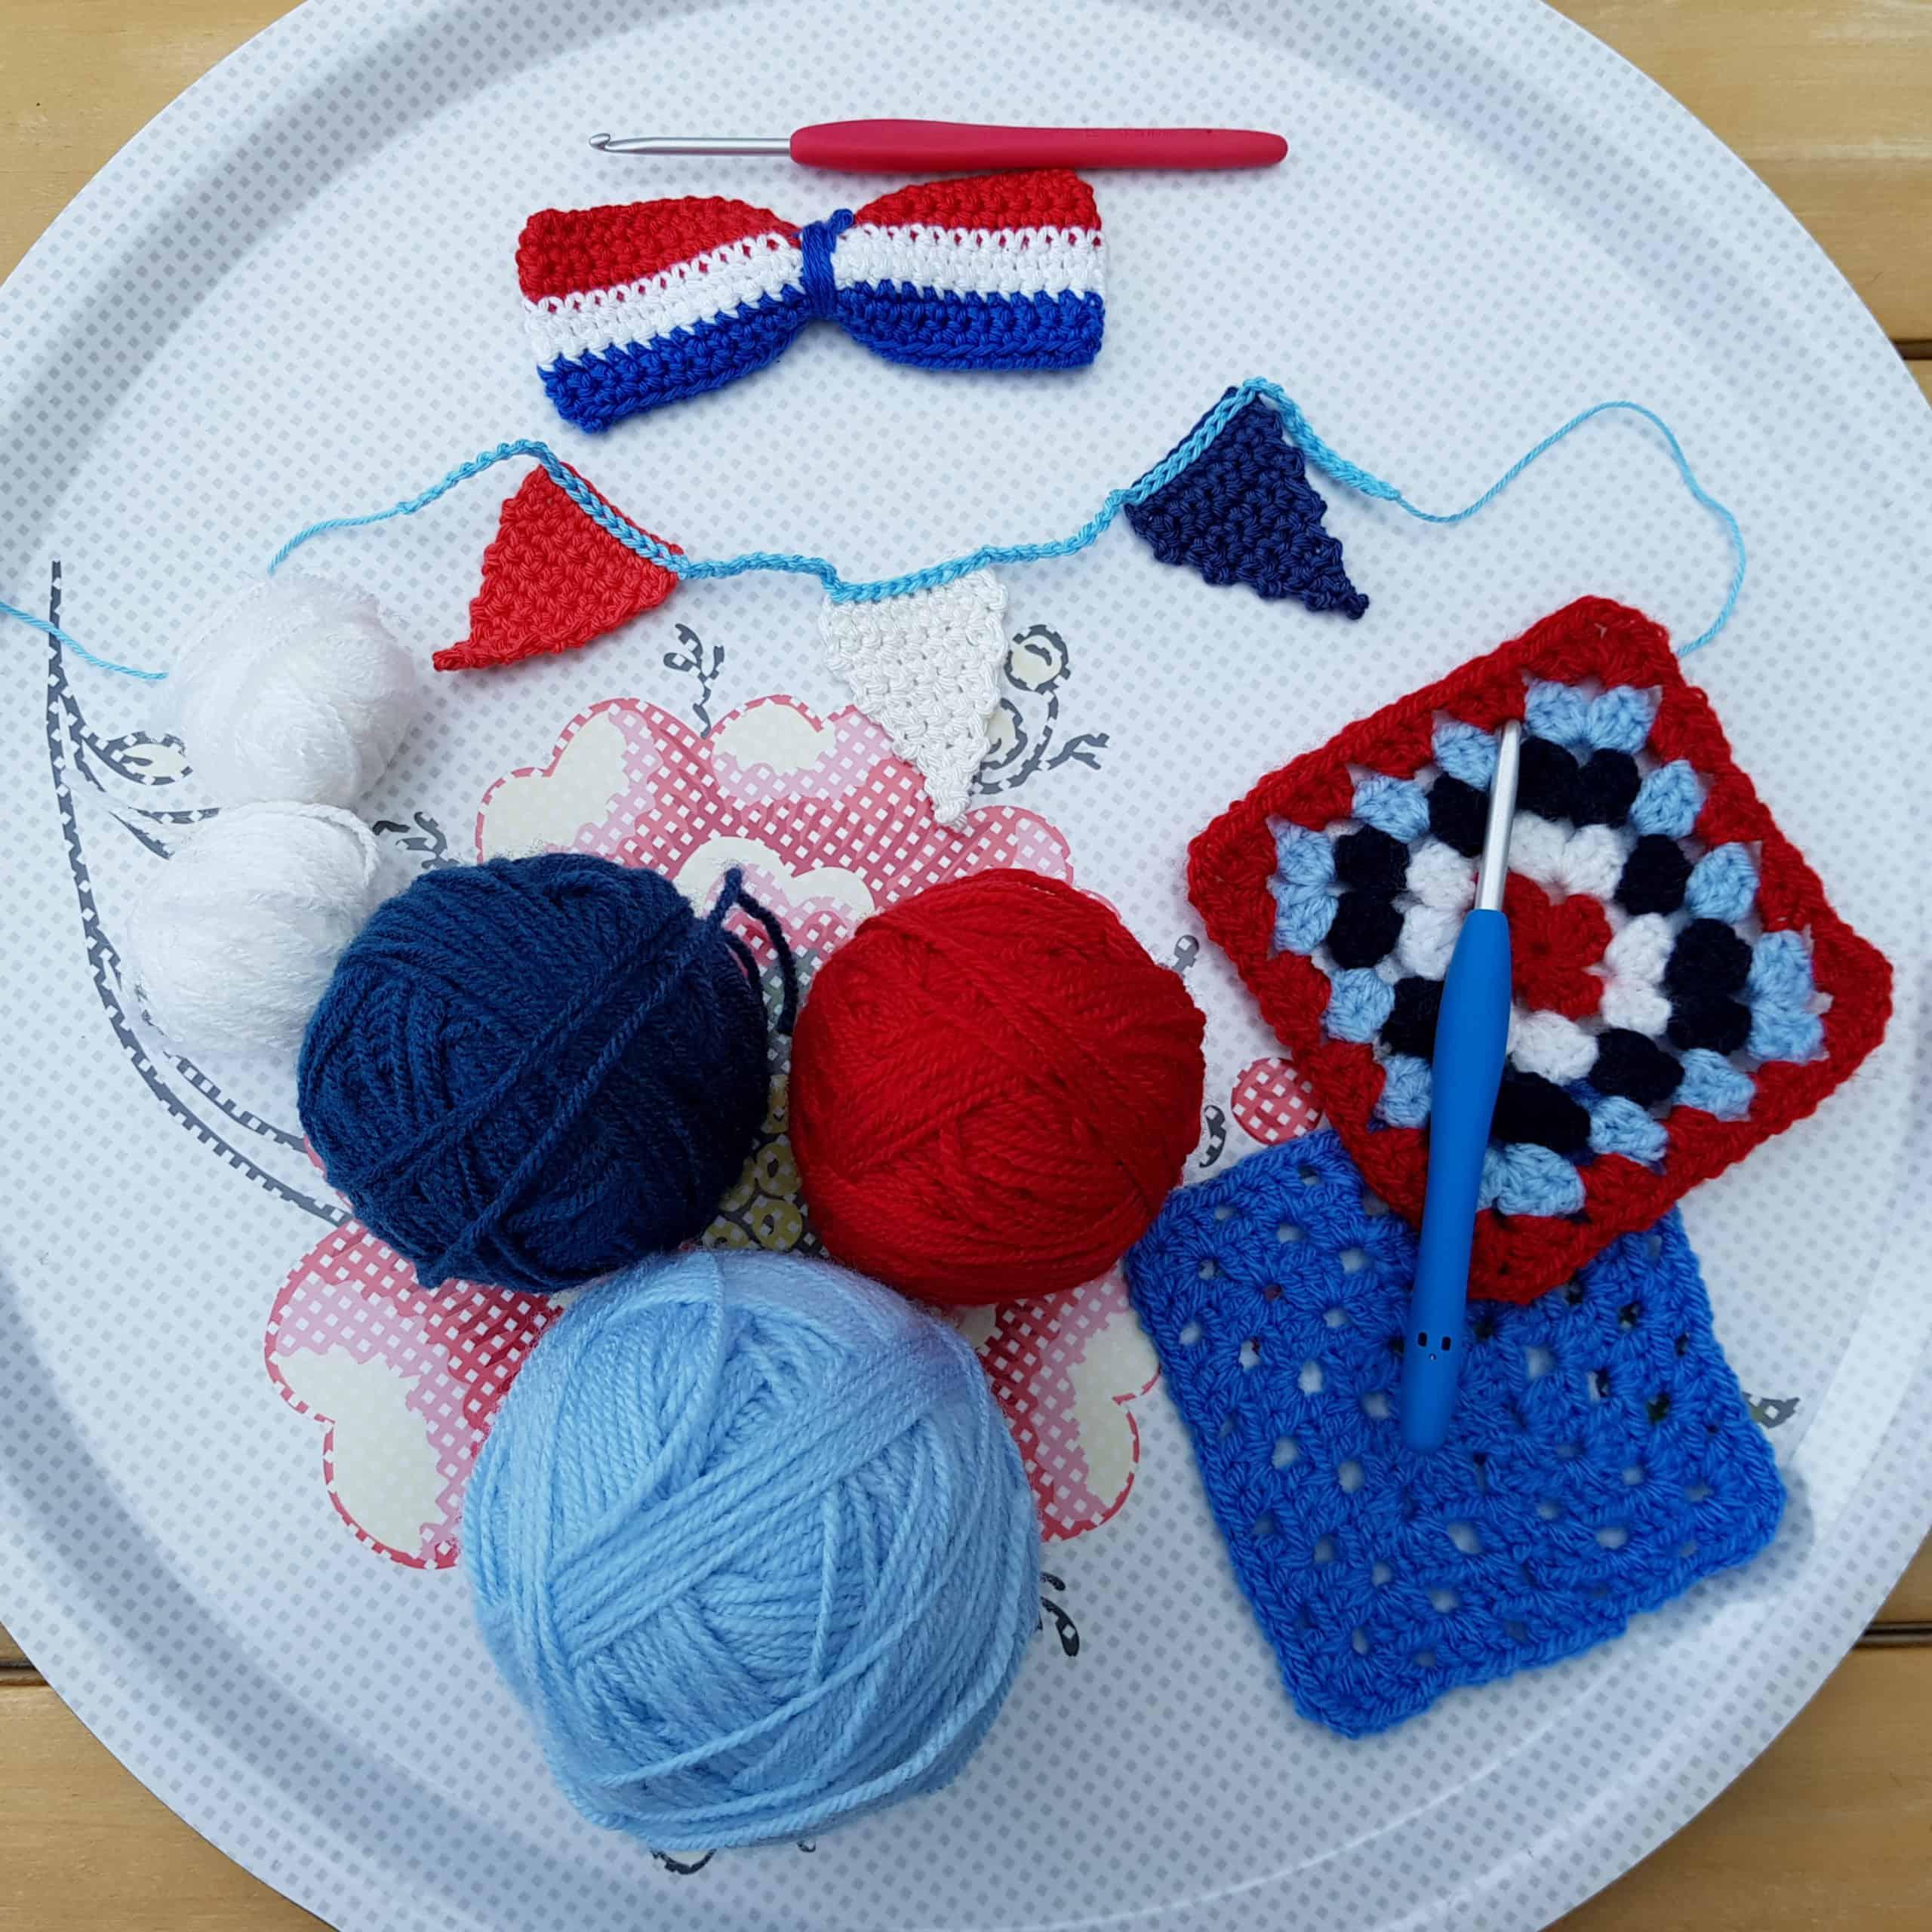 Cursussen, bollen wol in verschillende kleuren